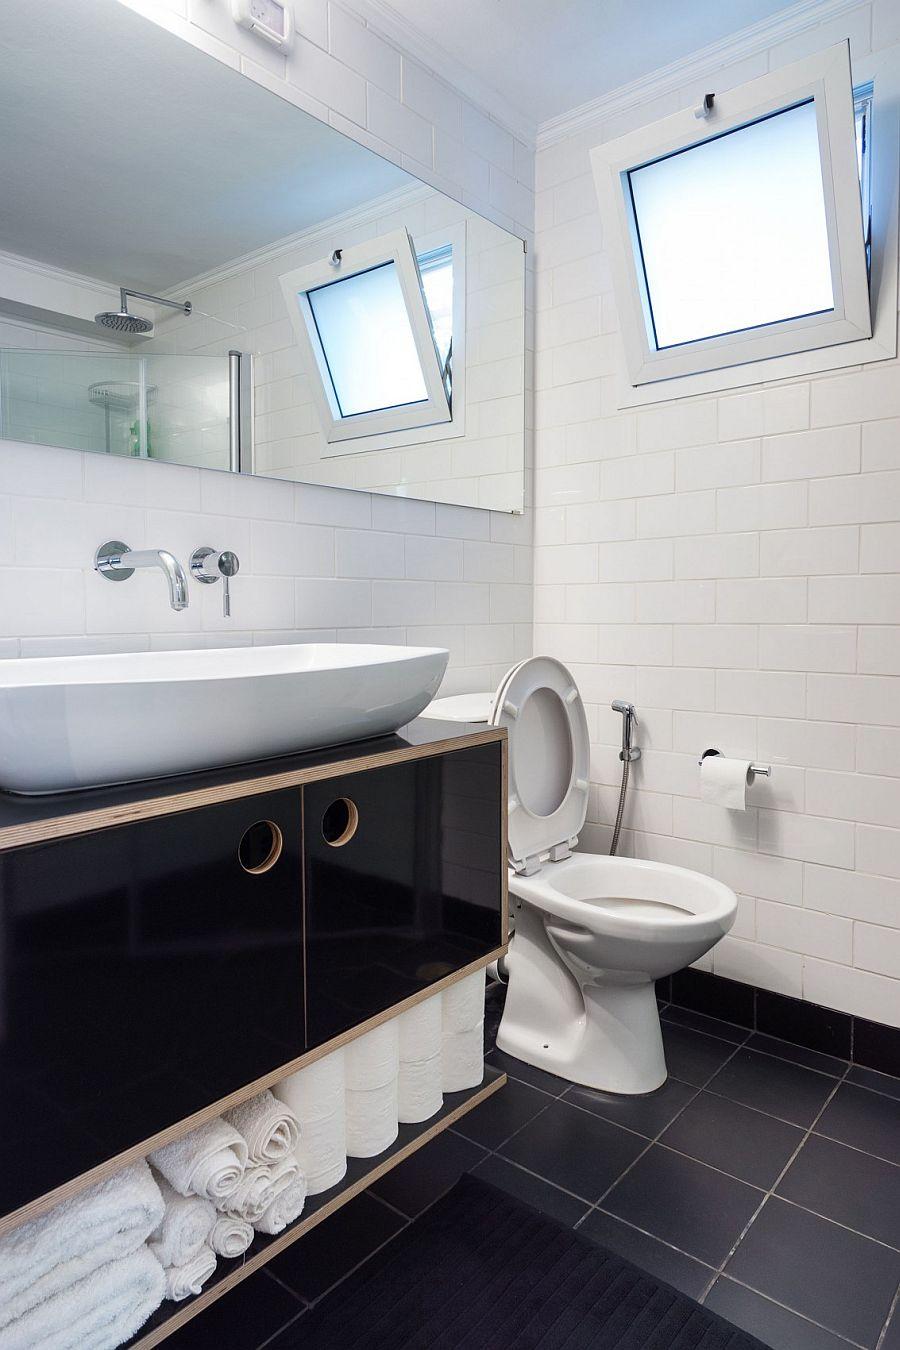 Black and white bathroom design inside the Moshav home